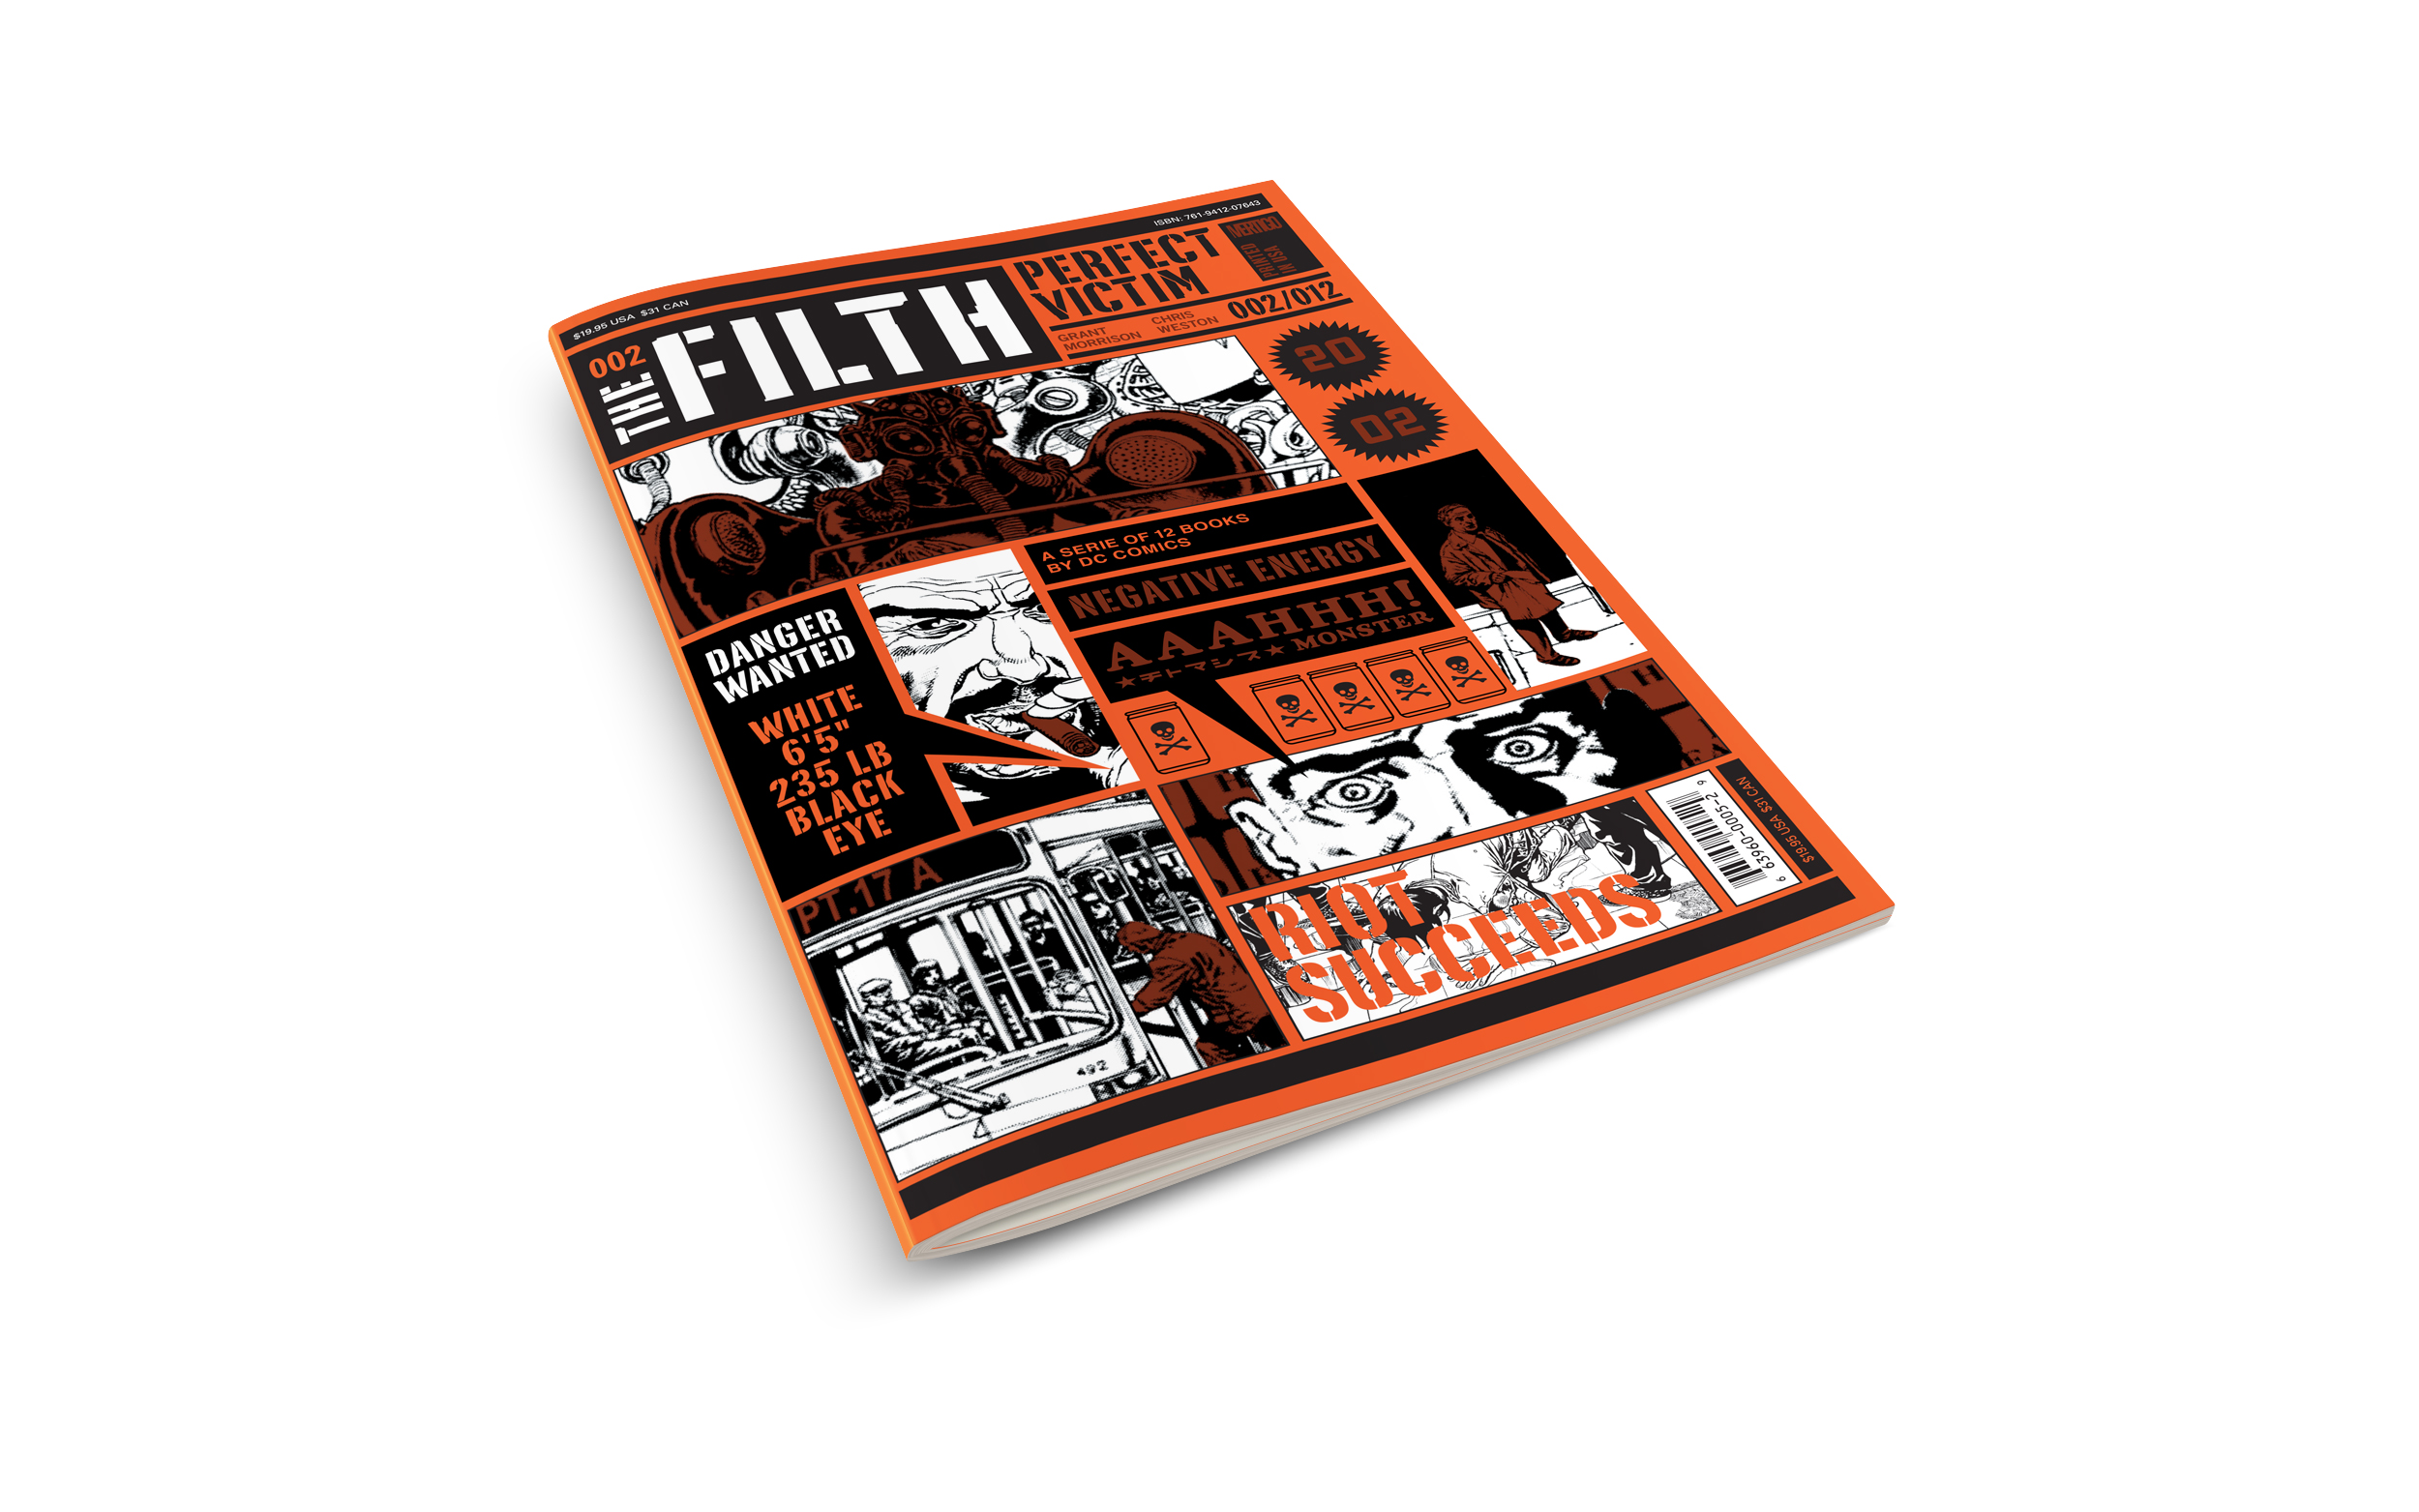 filth_us-vs-them_10_comp_2500w.jpg